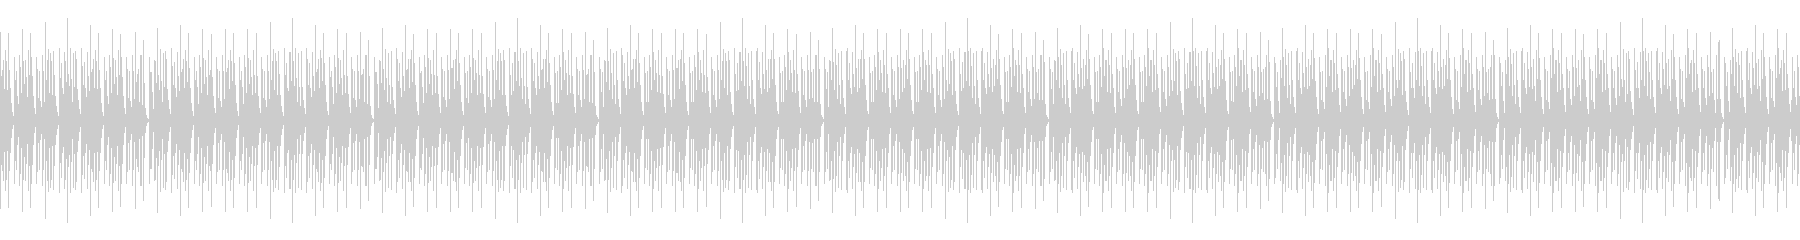 Vtuberの配信 雑談向けBGM 11の未再生の波形